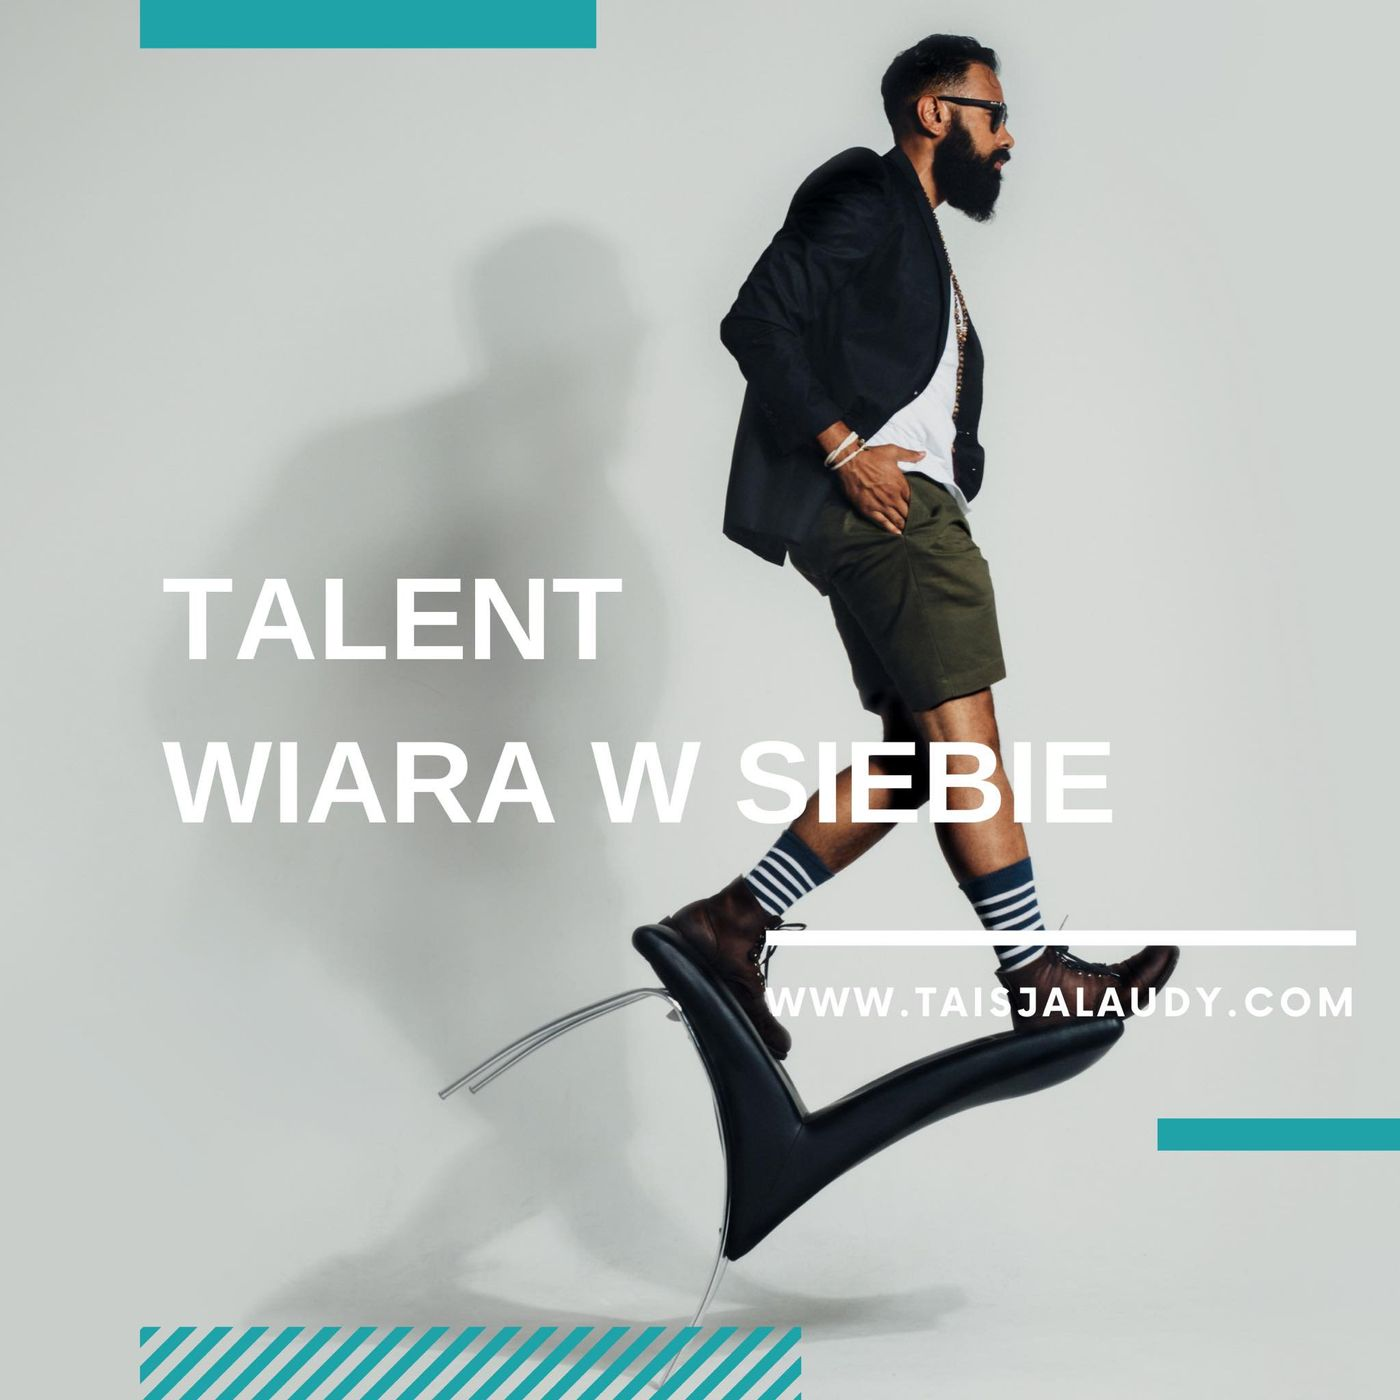 Talent Wiara w siebie (Self Assurance) - Test GALLUPa, Clifton StrengthsFinder 2.0